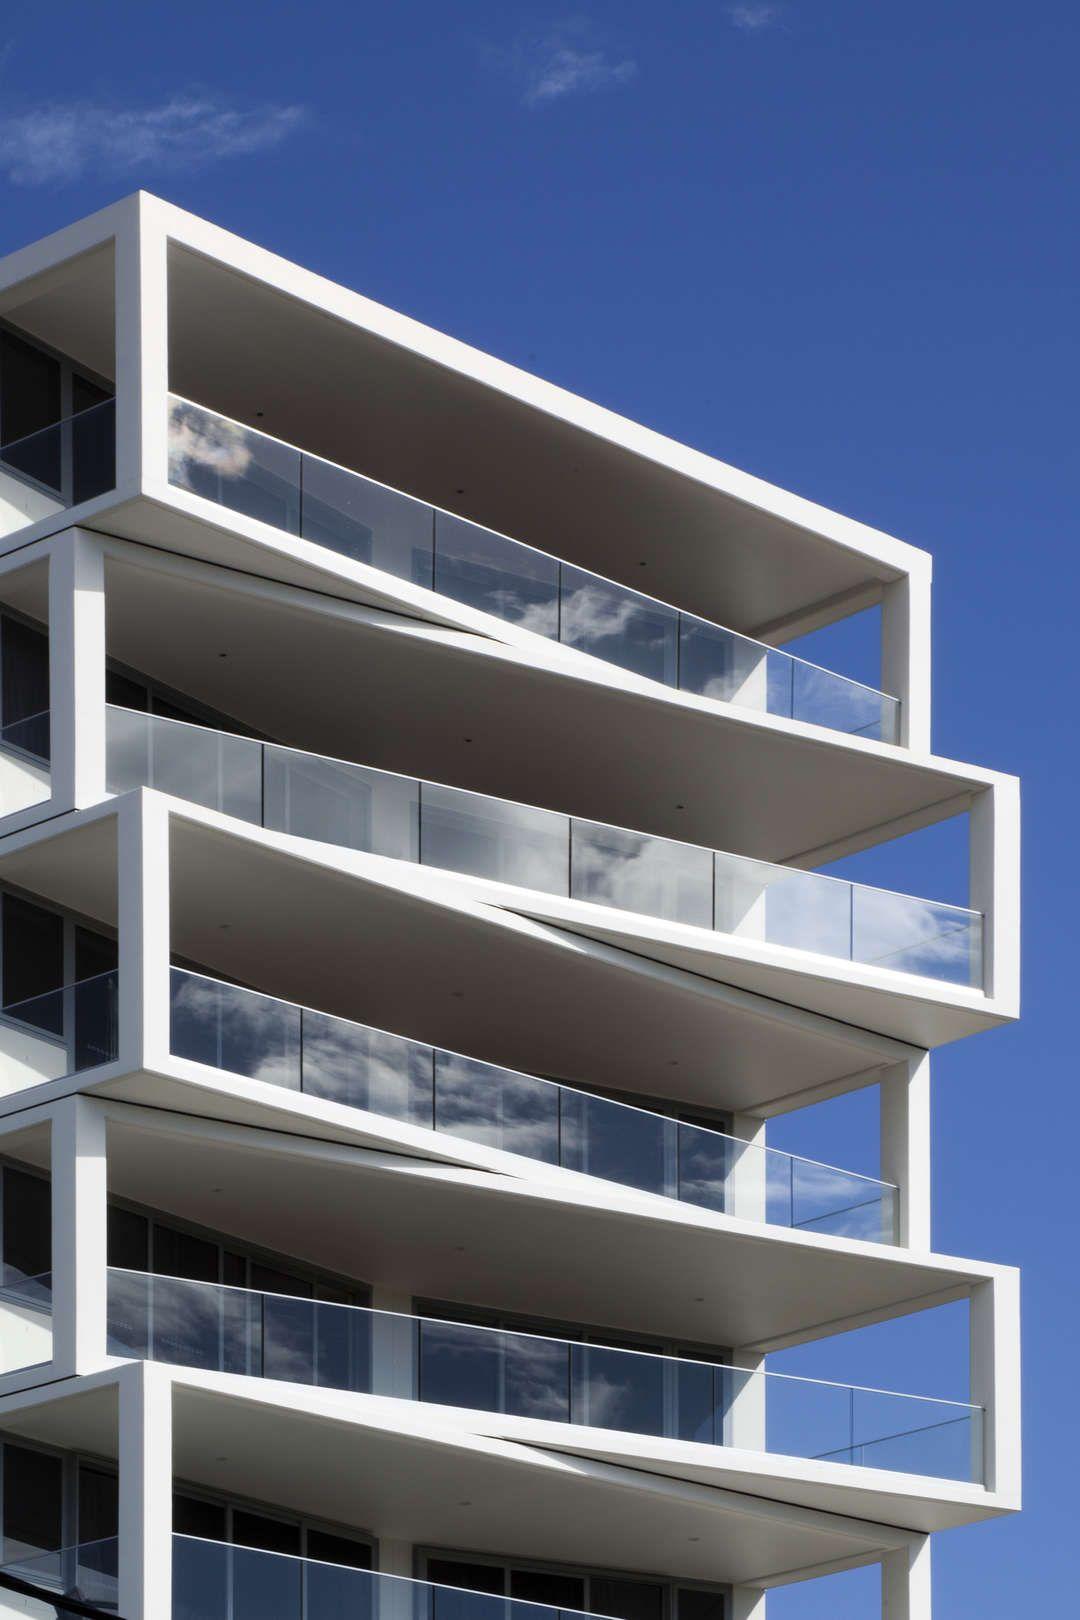 Torres com varandas dançantes - Brian Meyerson | Facade architecture, Modern  architecture, Residential architecture